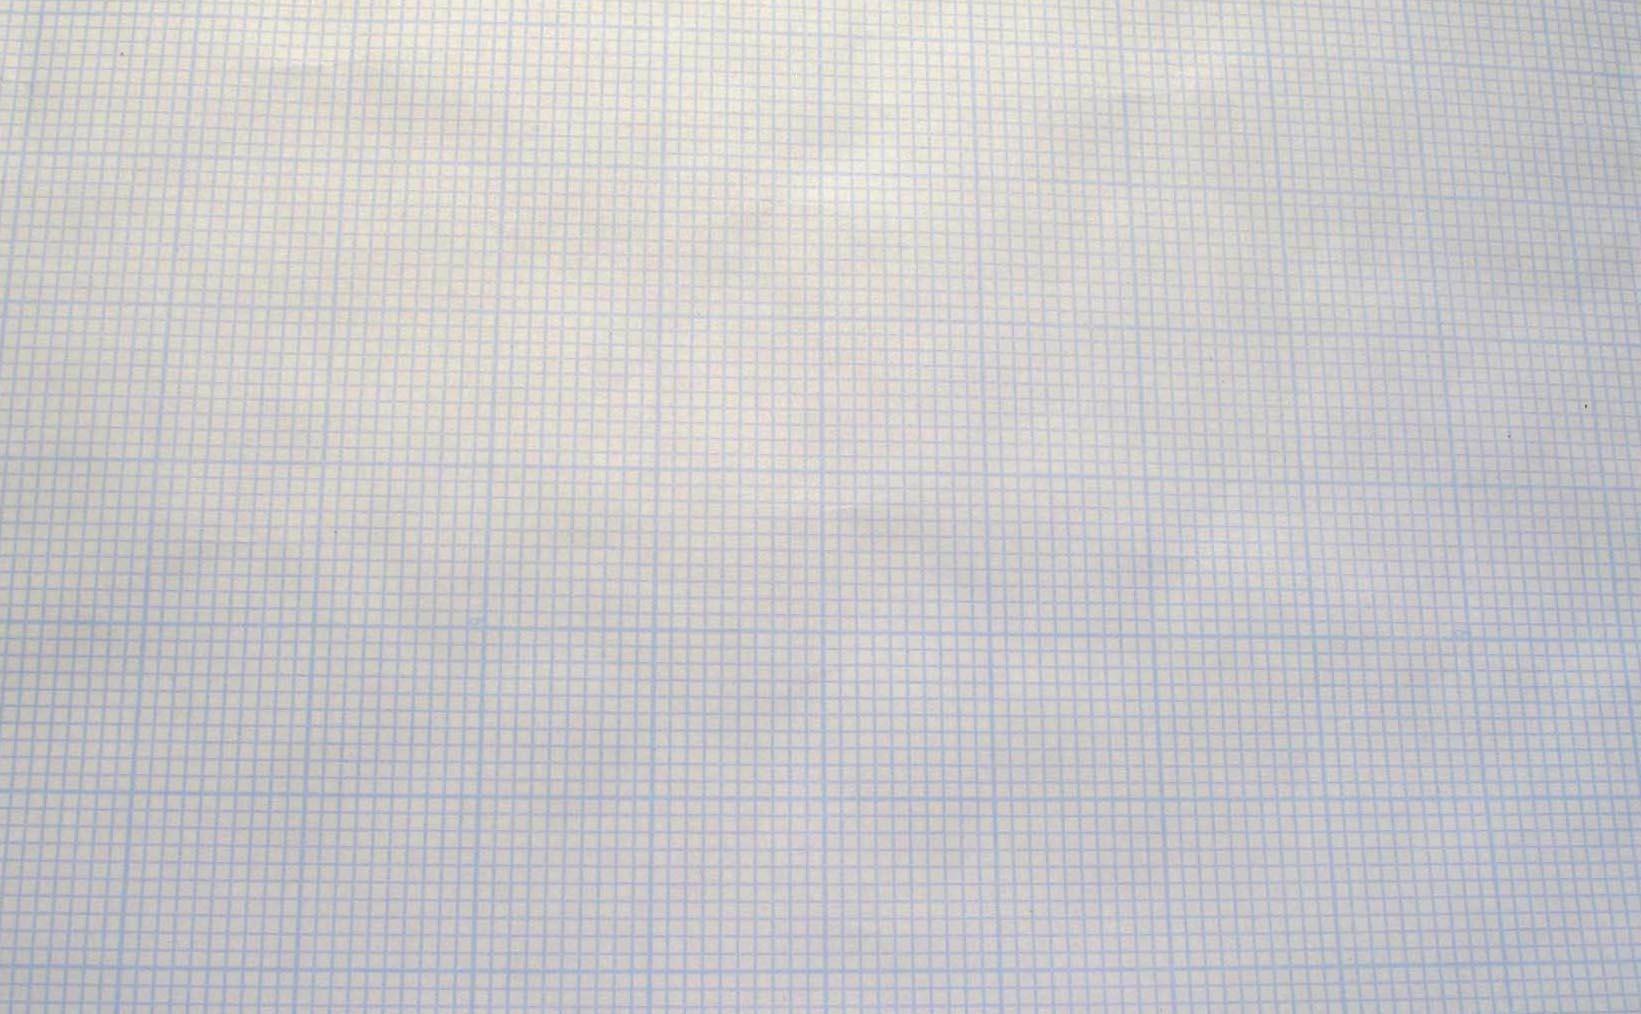 Cool 3d Wallpaper Websites Fullscreen Hd Wallpapers Free Download Pixelstalk Net